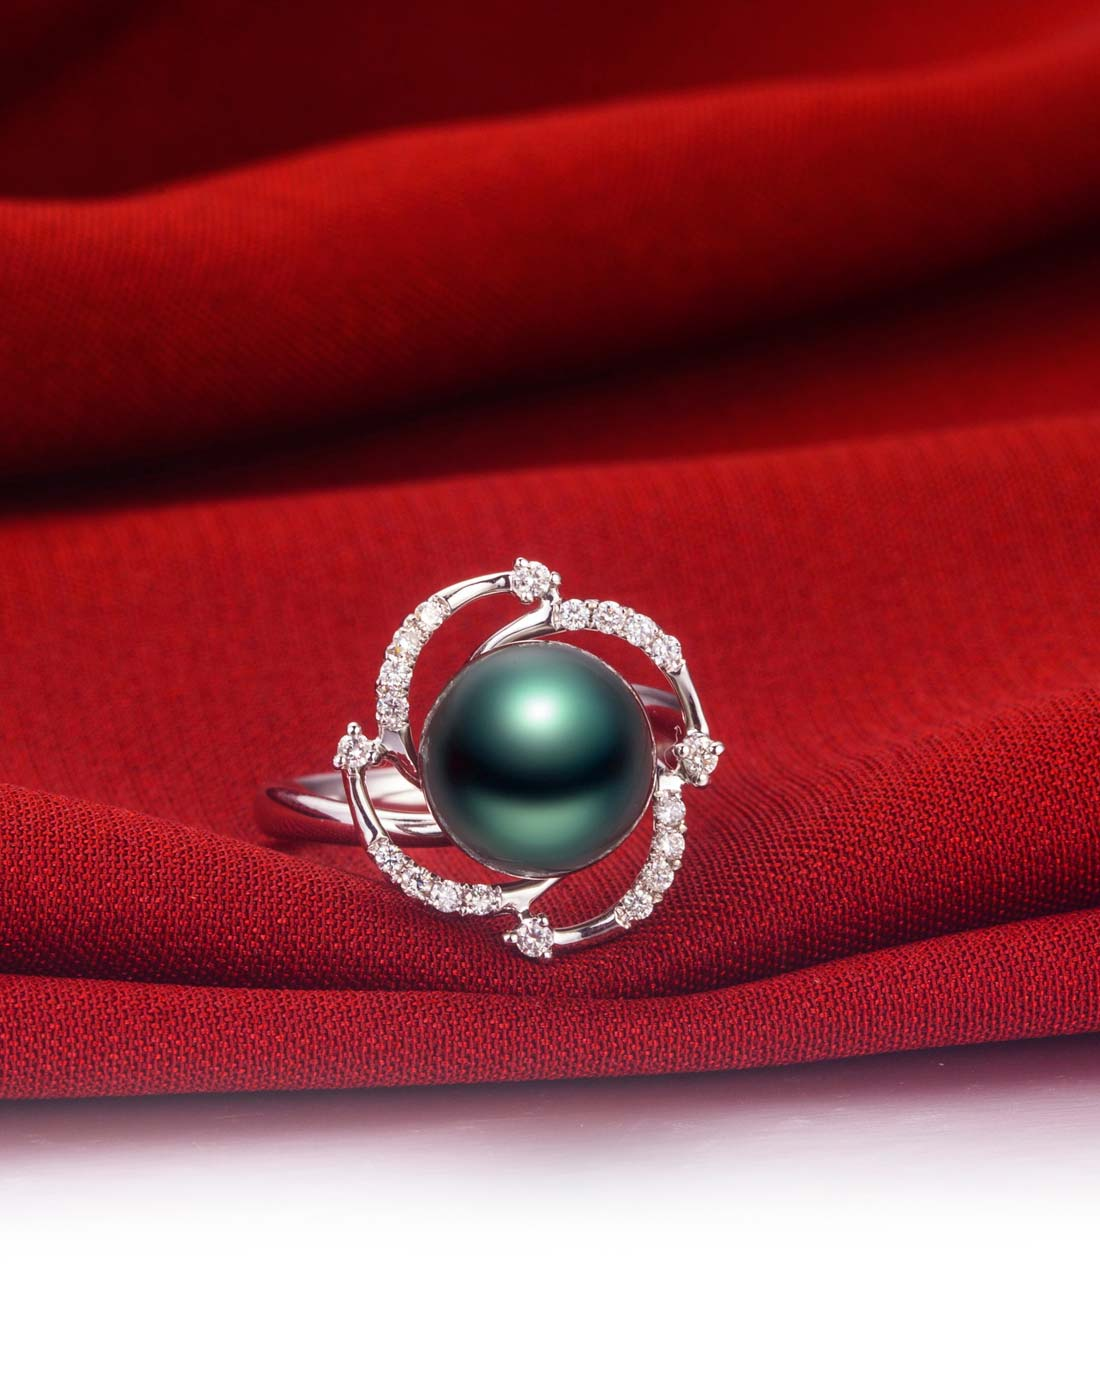 爱度doido珠宝专场18k金珍珠戒指id017157